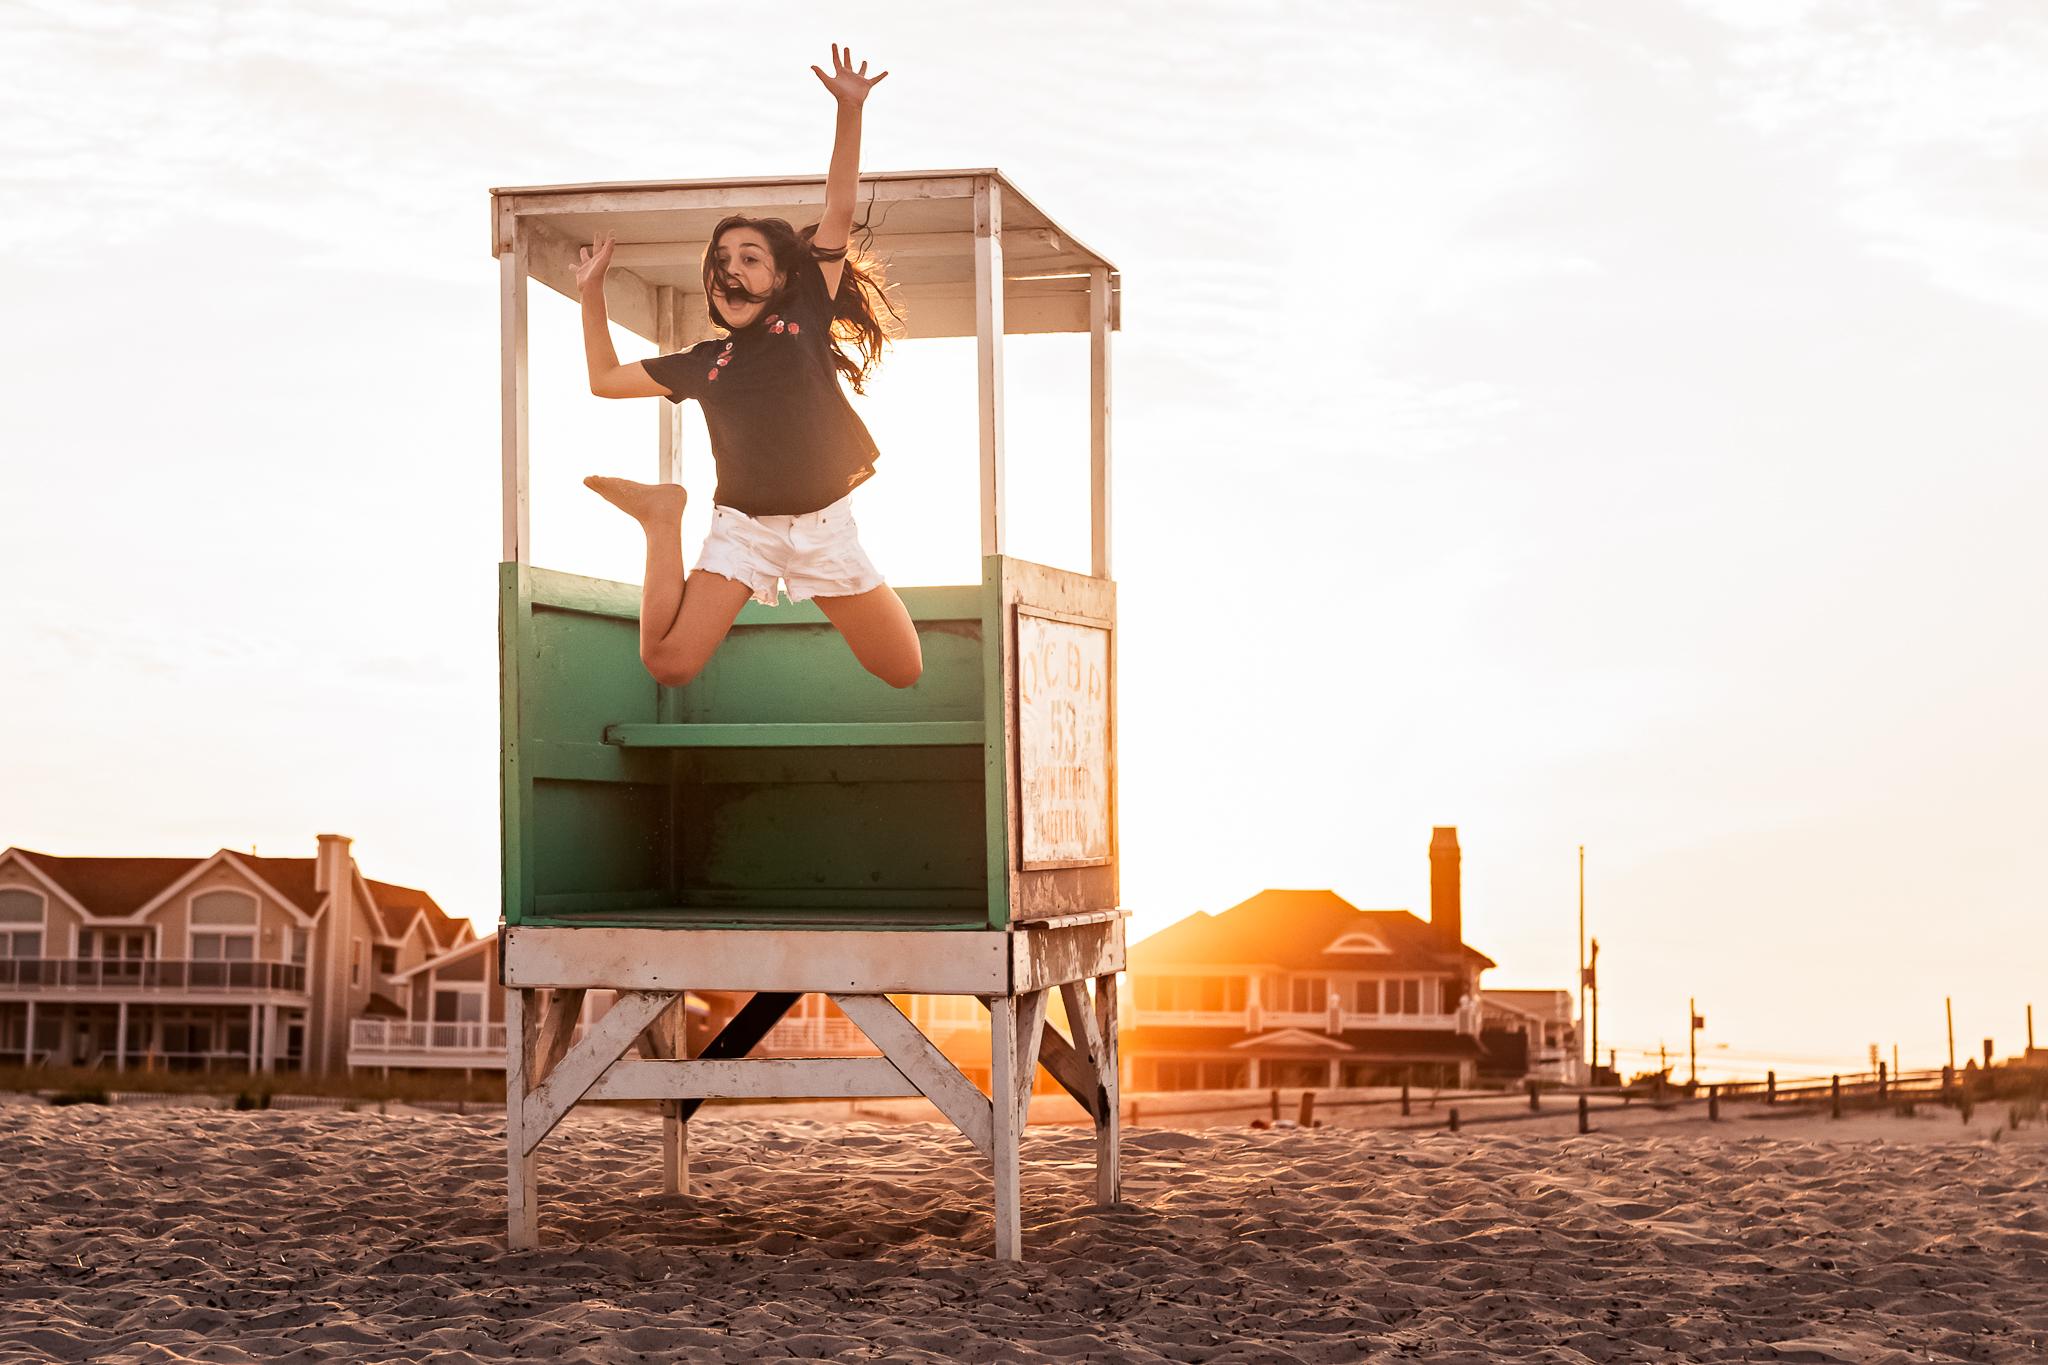 NancyElizabethPhotography, South Jersey Photographer, Jumping off lifeguard stand